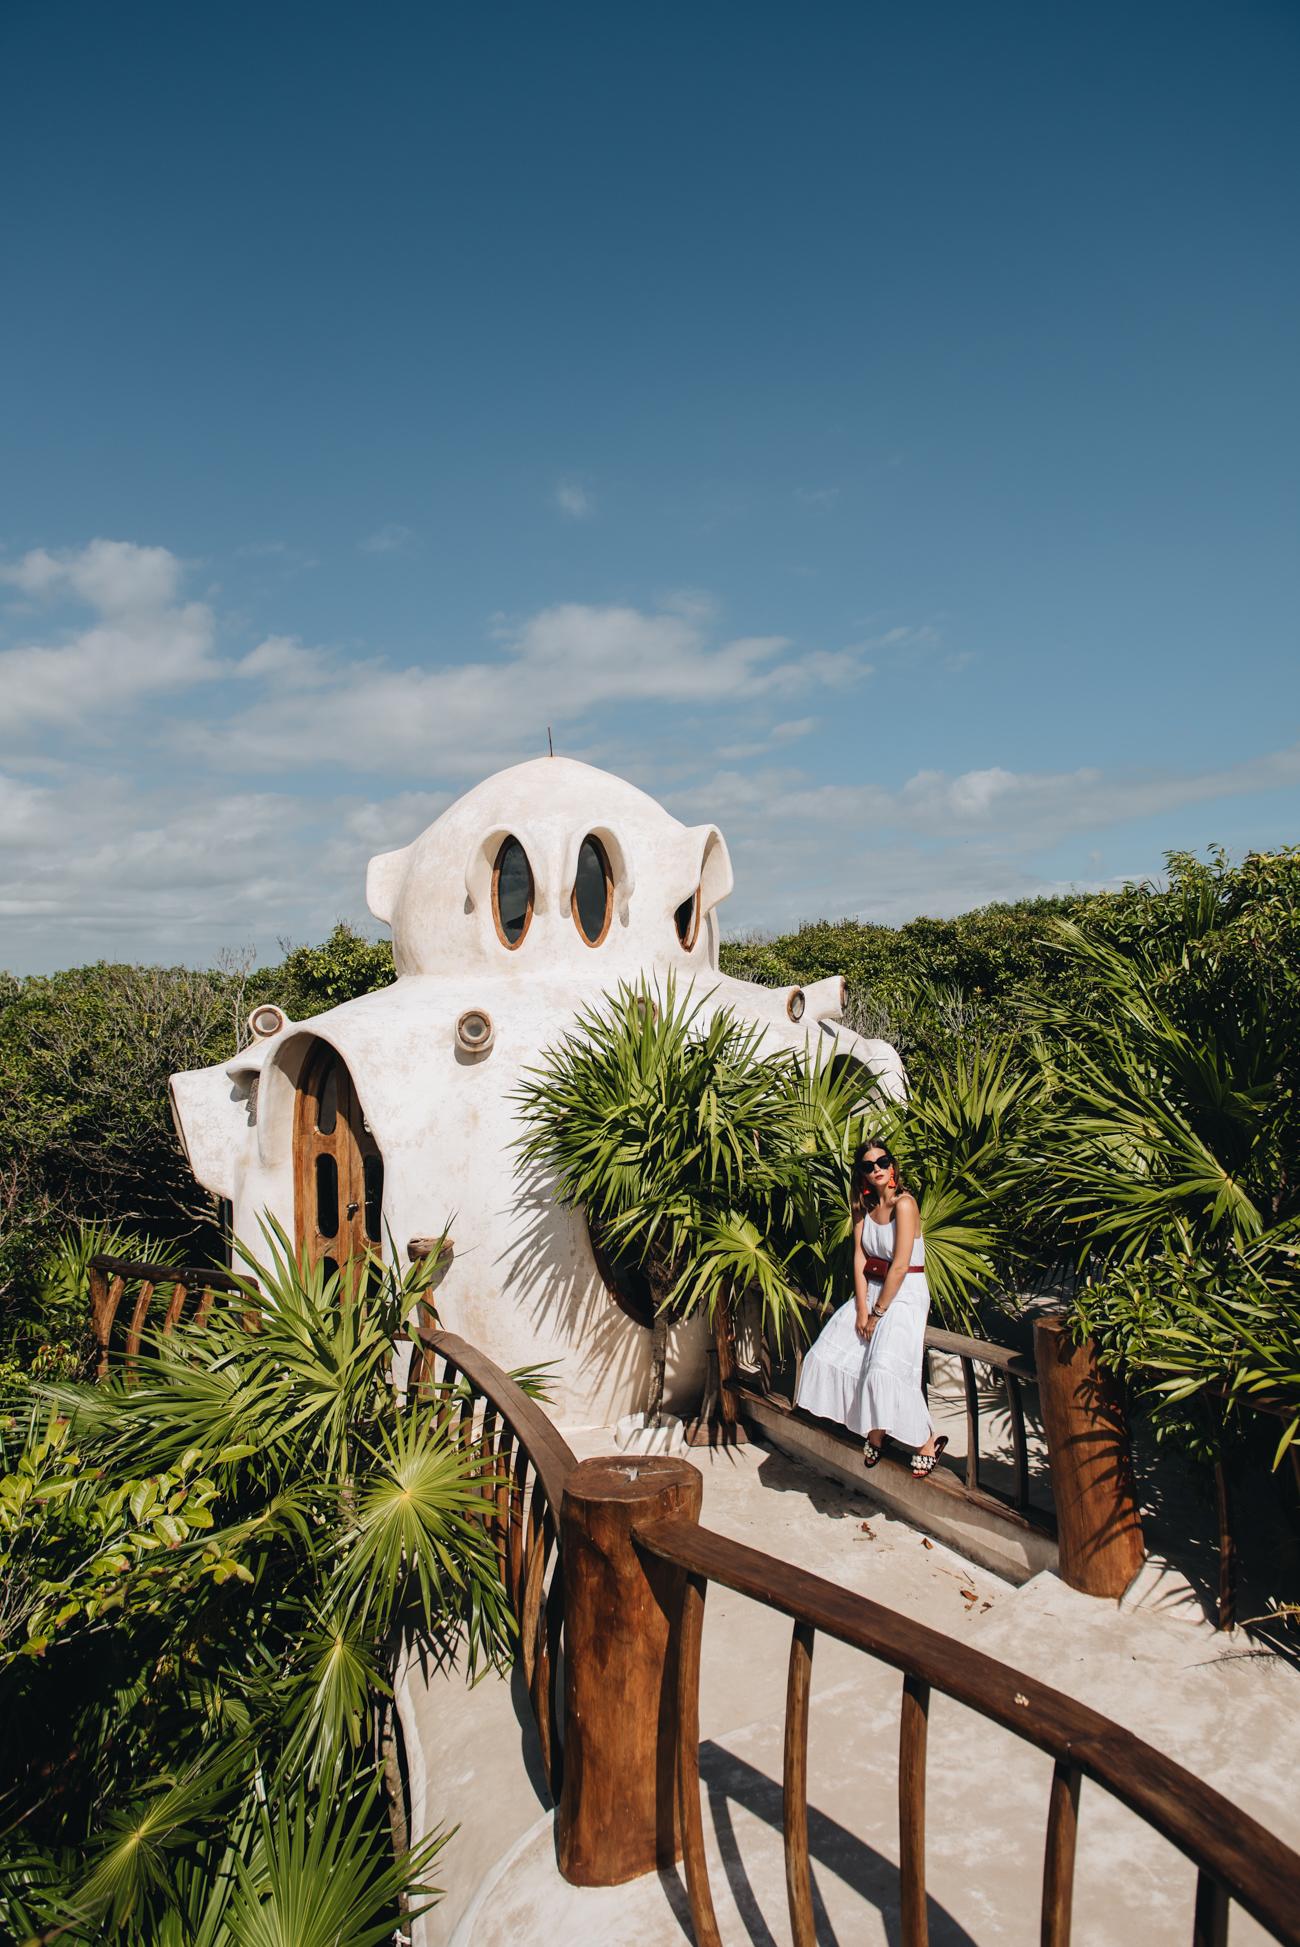 Papaya-playa-project-tulum-hotel-anlage-baumhaus-tree-house-nina-schwichtenberg-fashiioncarpet